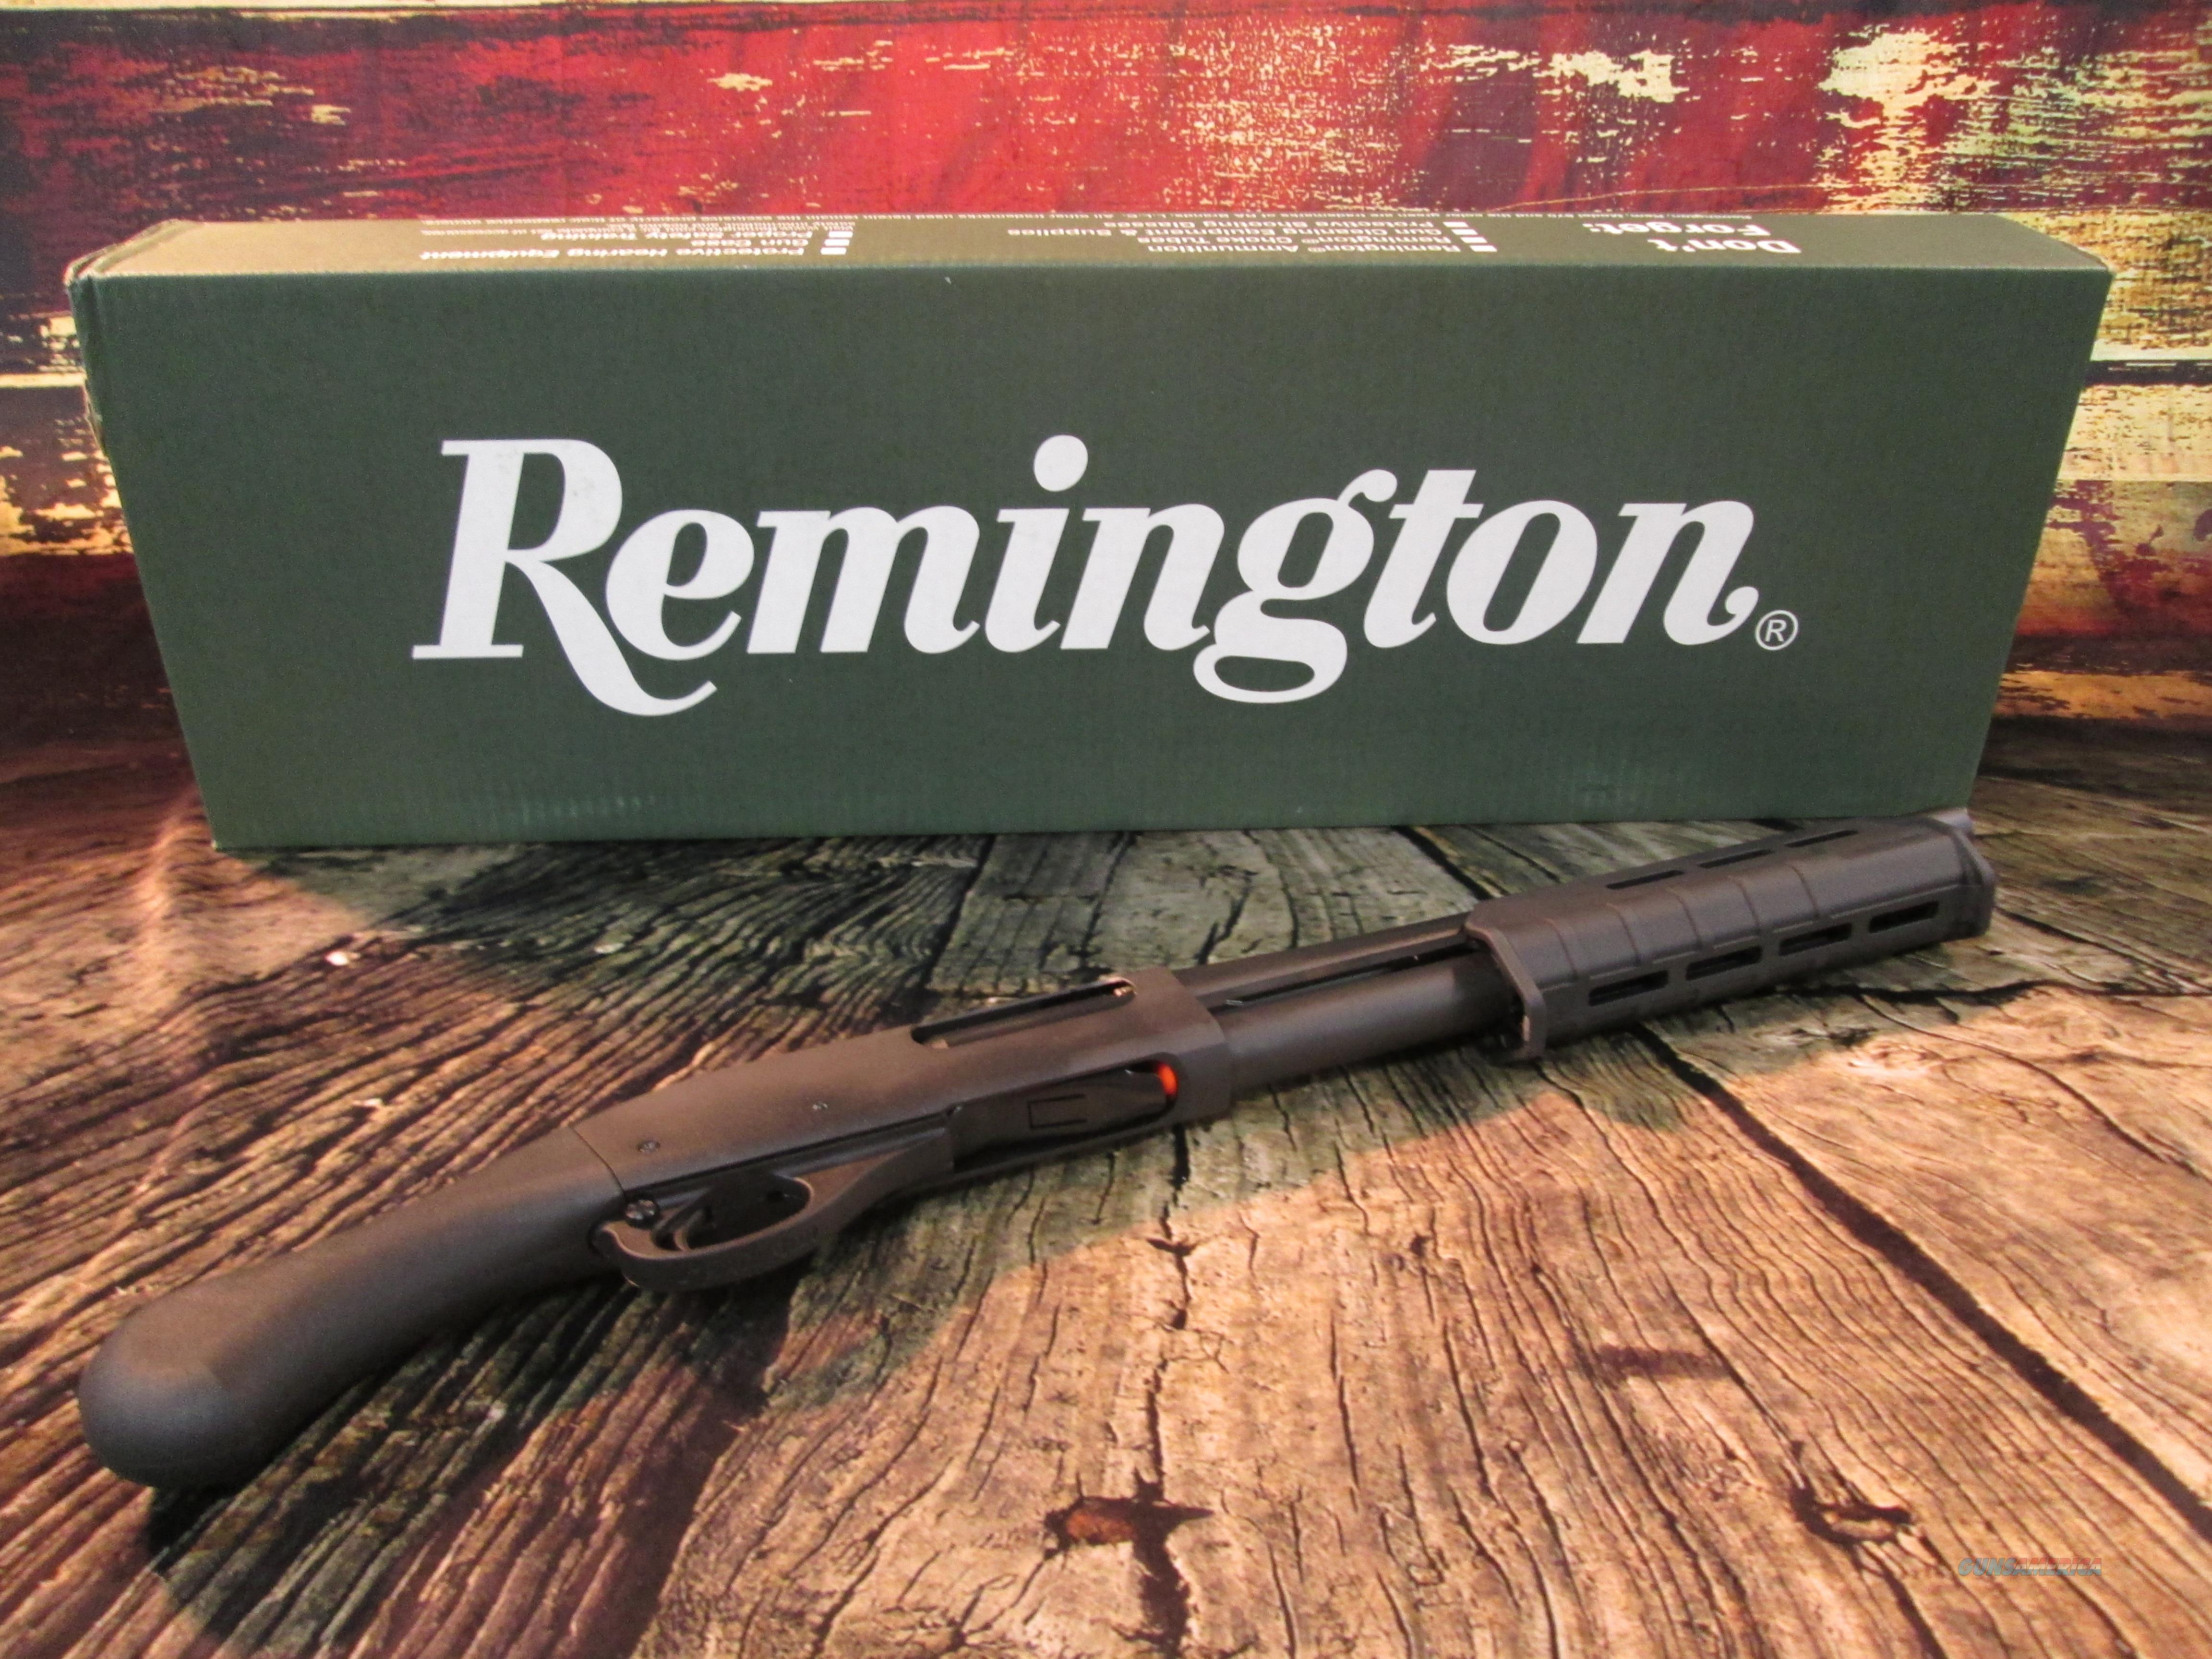 REMINGTON 870 TAC-14 12G SHOTGUN (81230)   Guns > Shotguns > Remington Shotguns  > Pump > Tactical